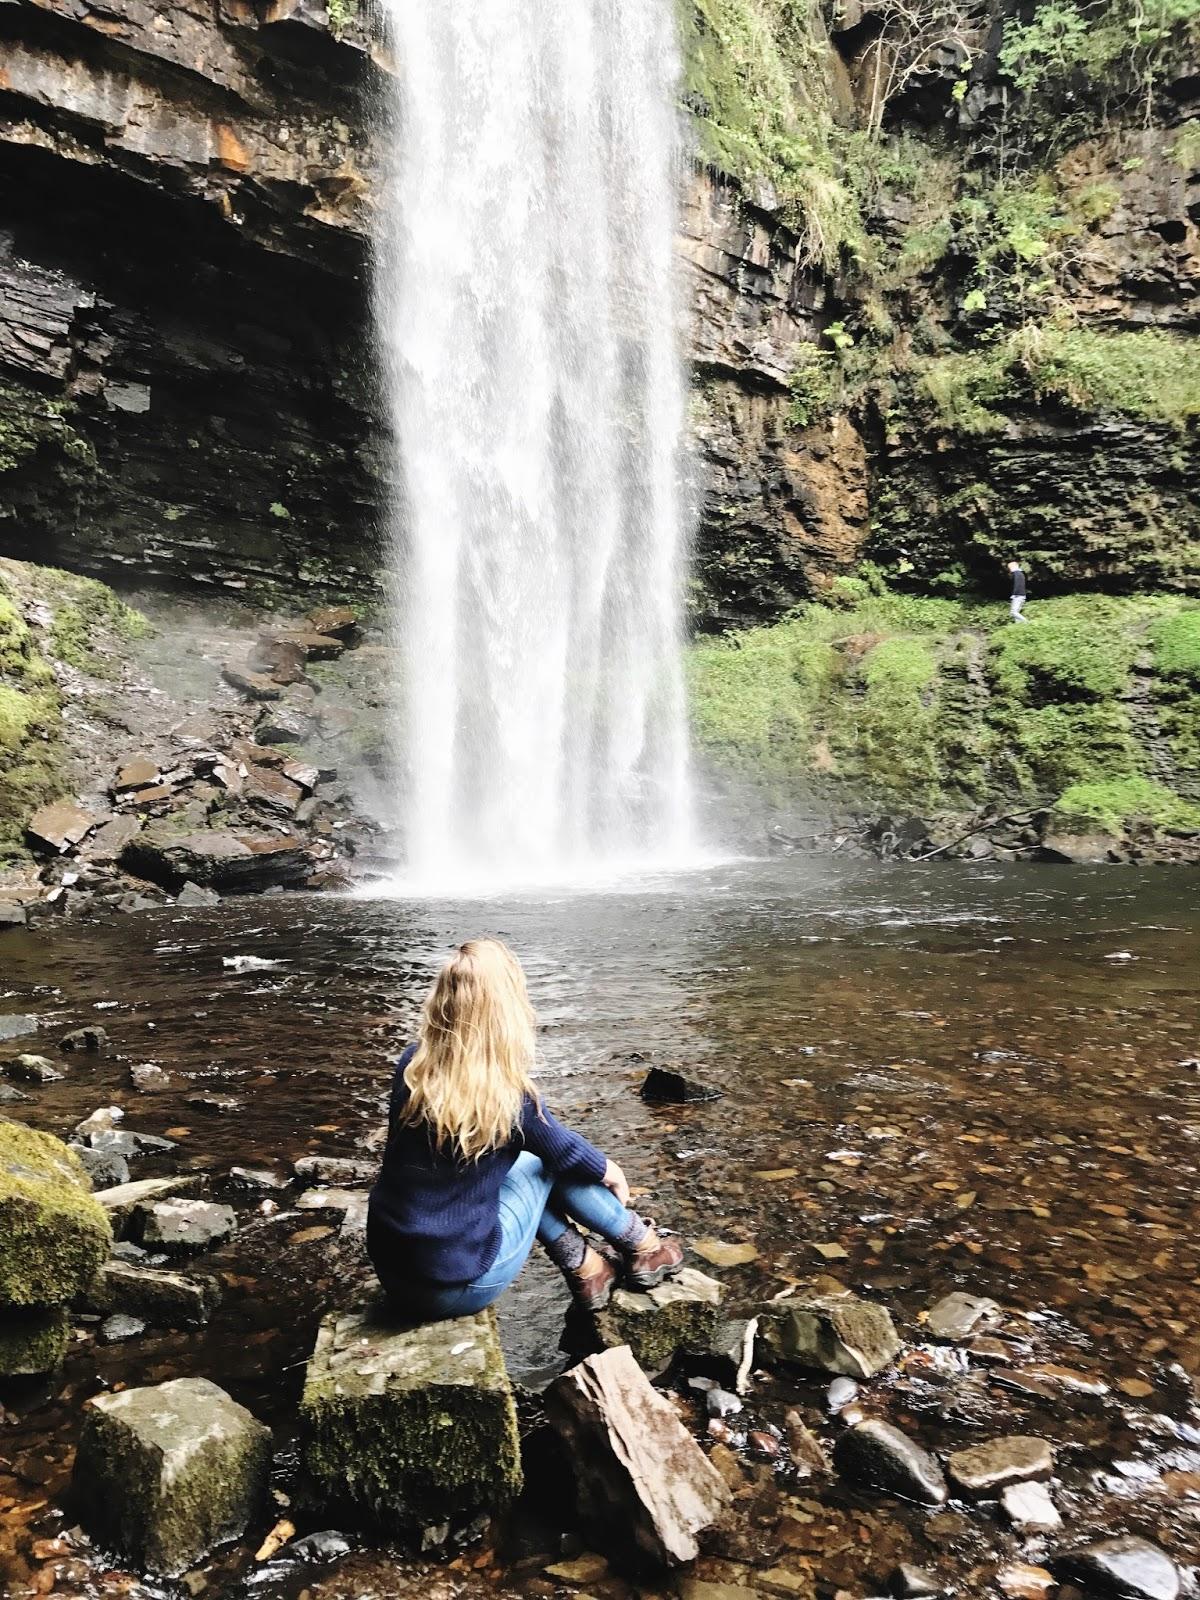 Sgwd Henrhyd Wales, travel blog, lifestyle blog, waterfalls in Wales